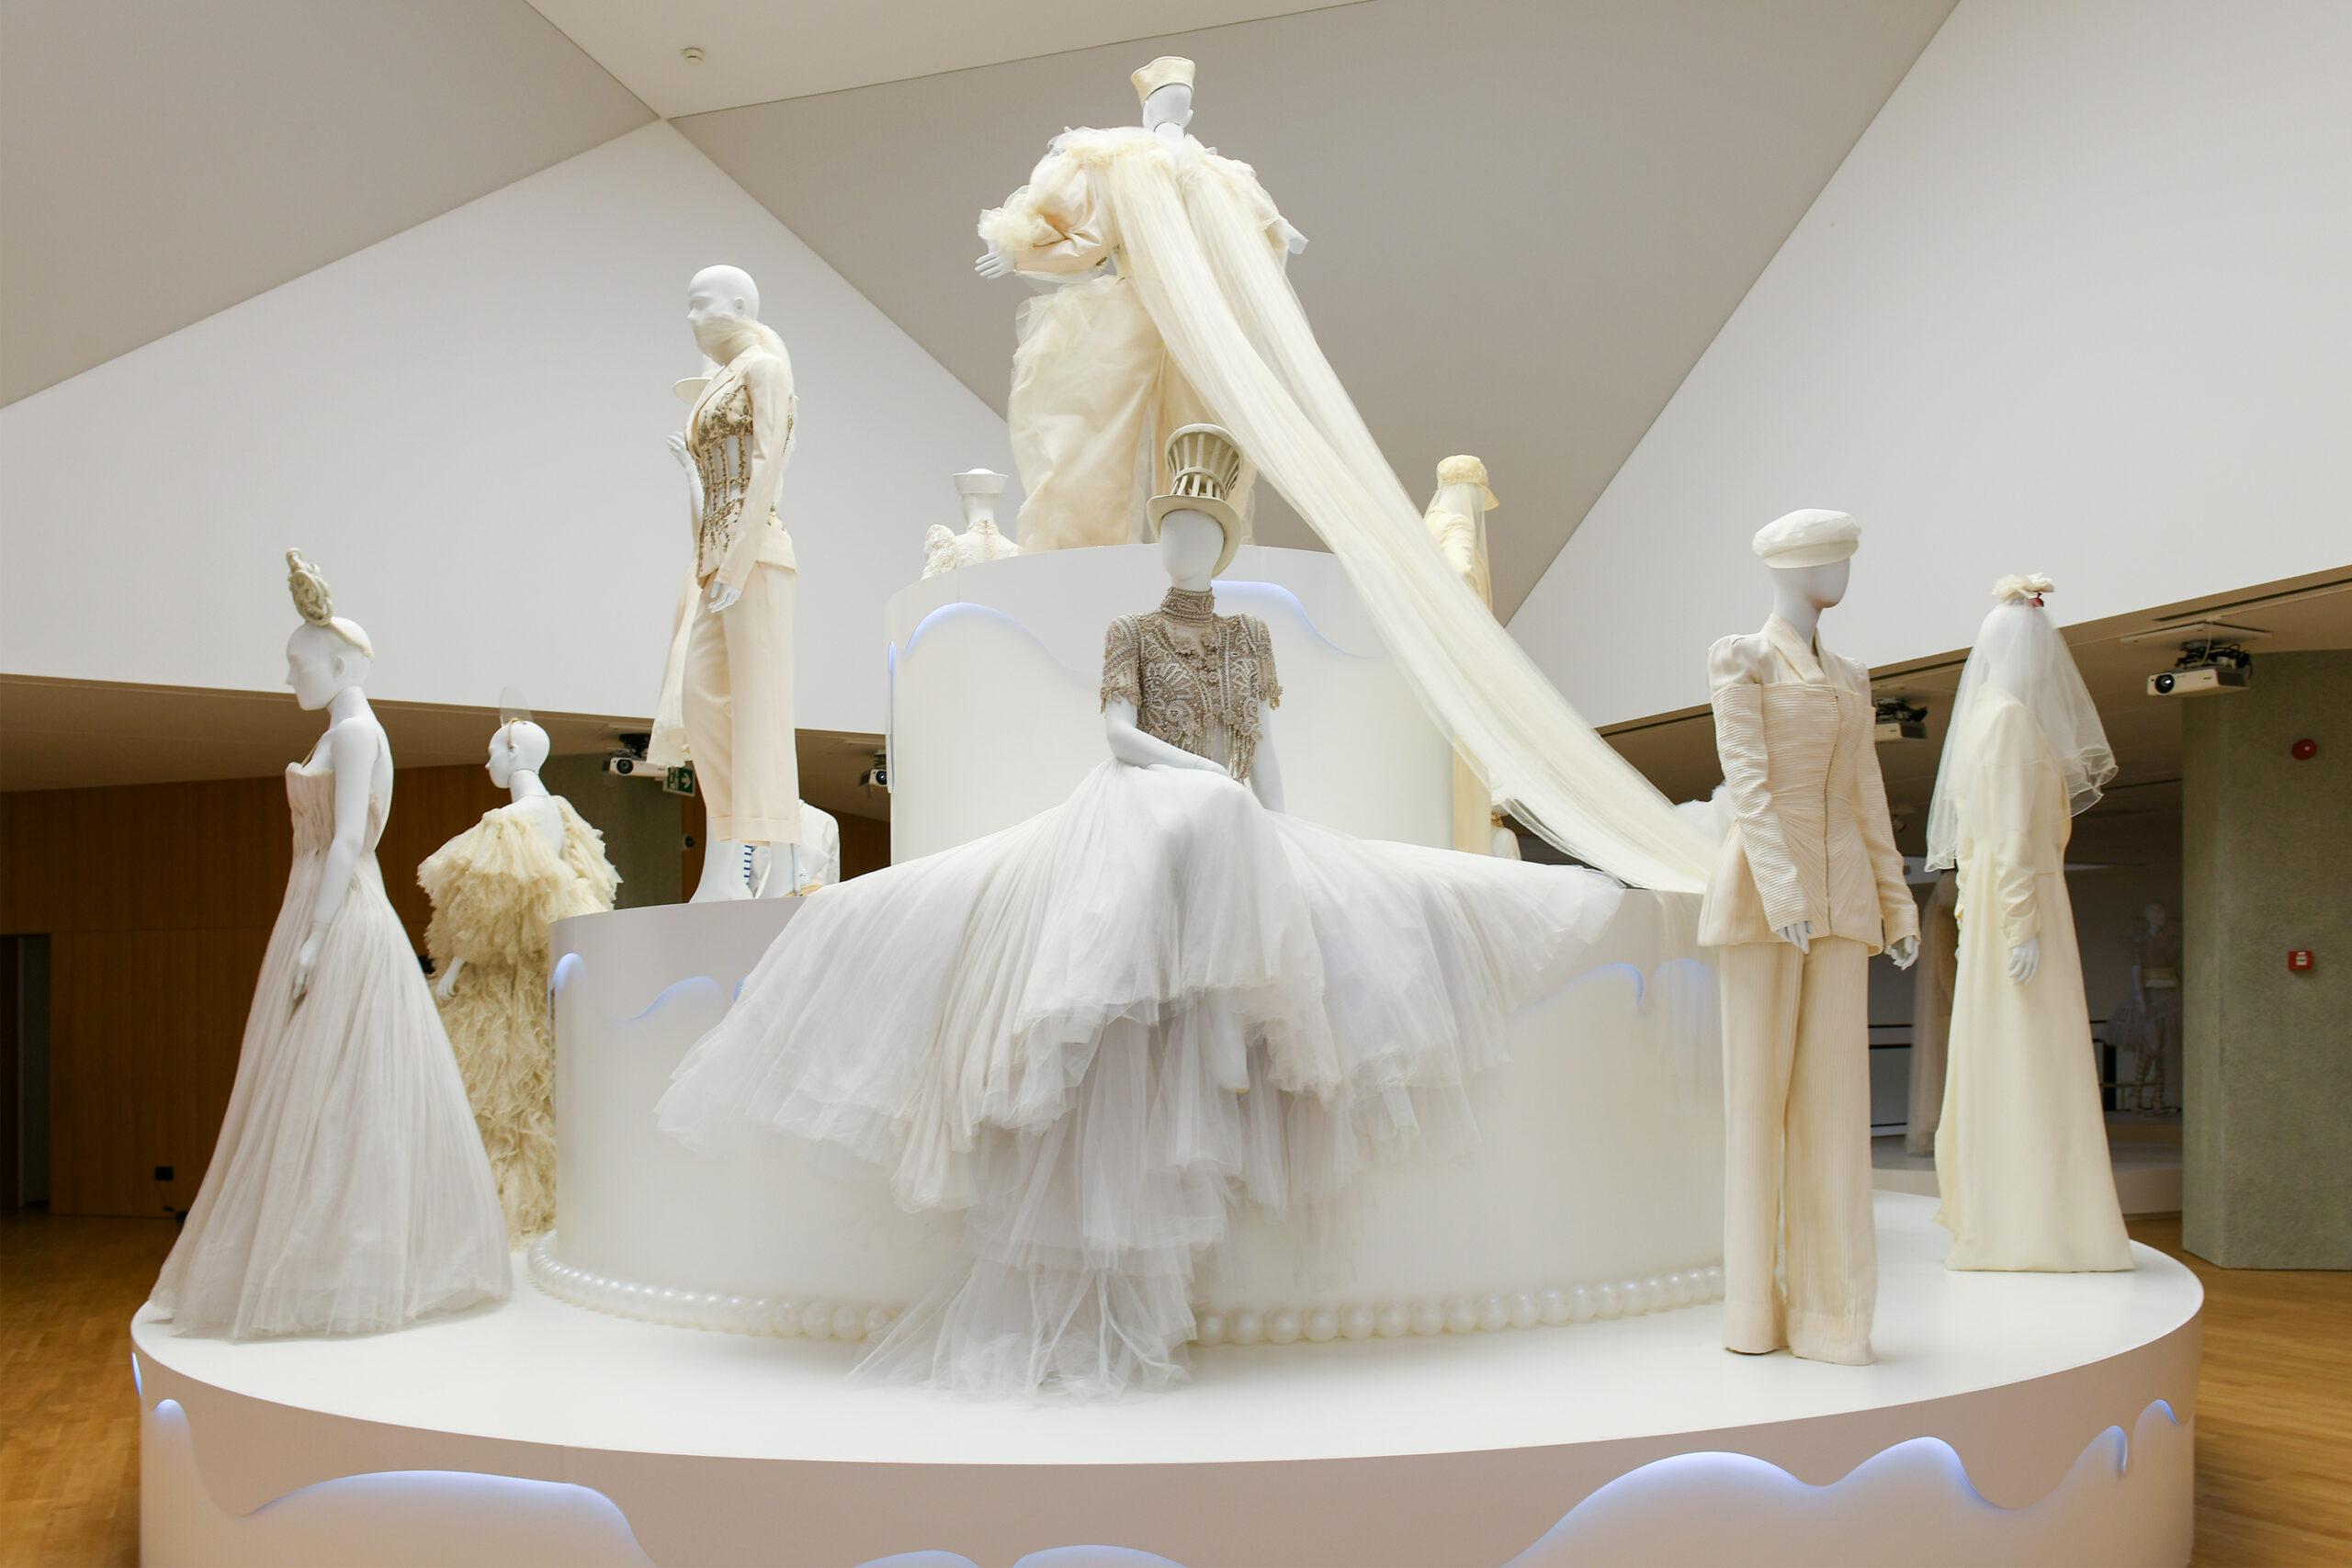 jean paul gaultier, bridal, MMFA, MSUB, Montreal Museum of Fine Arts, Exhibition, Europe, Serbia, Folioyvr, ecoluxluv, helen siwak, vancouver, bc, vancity, yvr